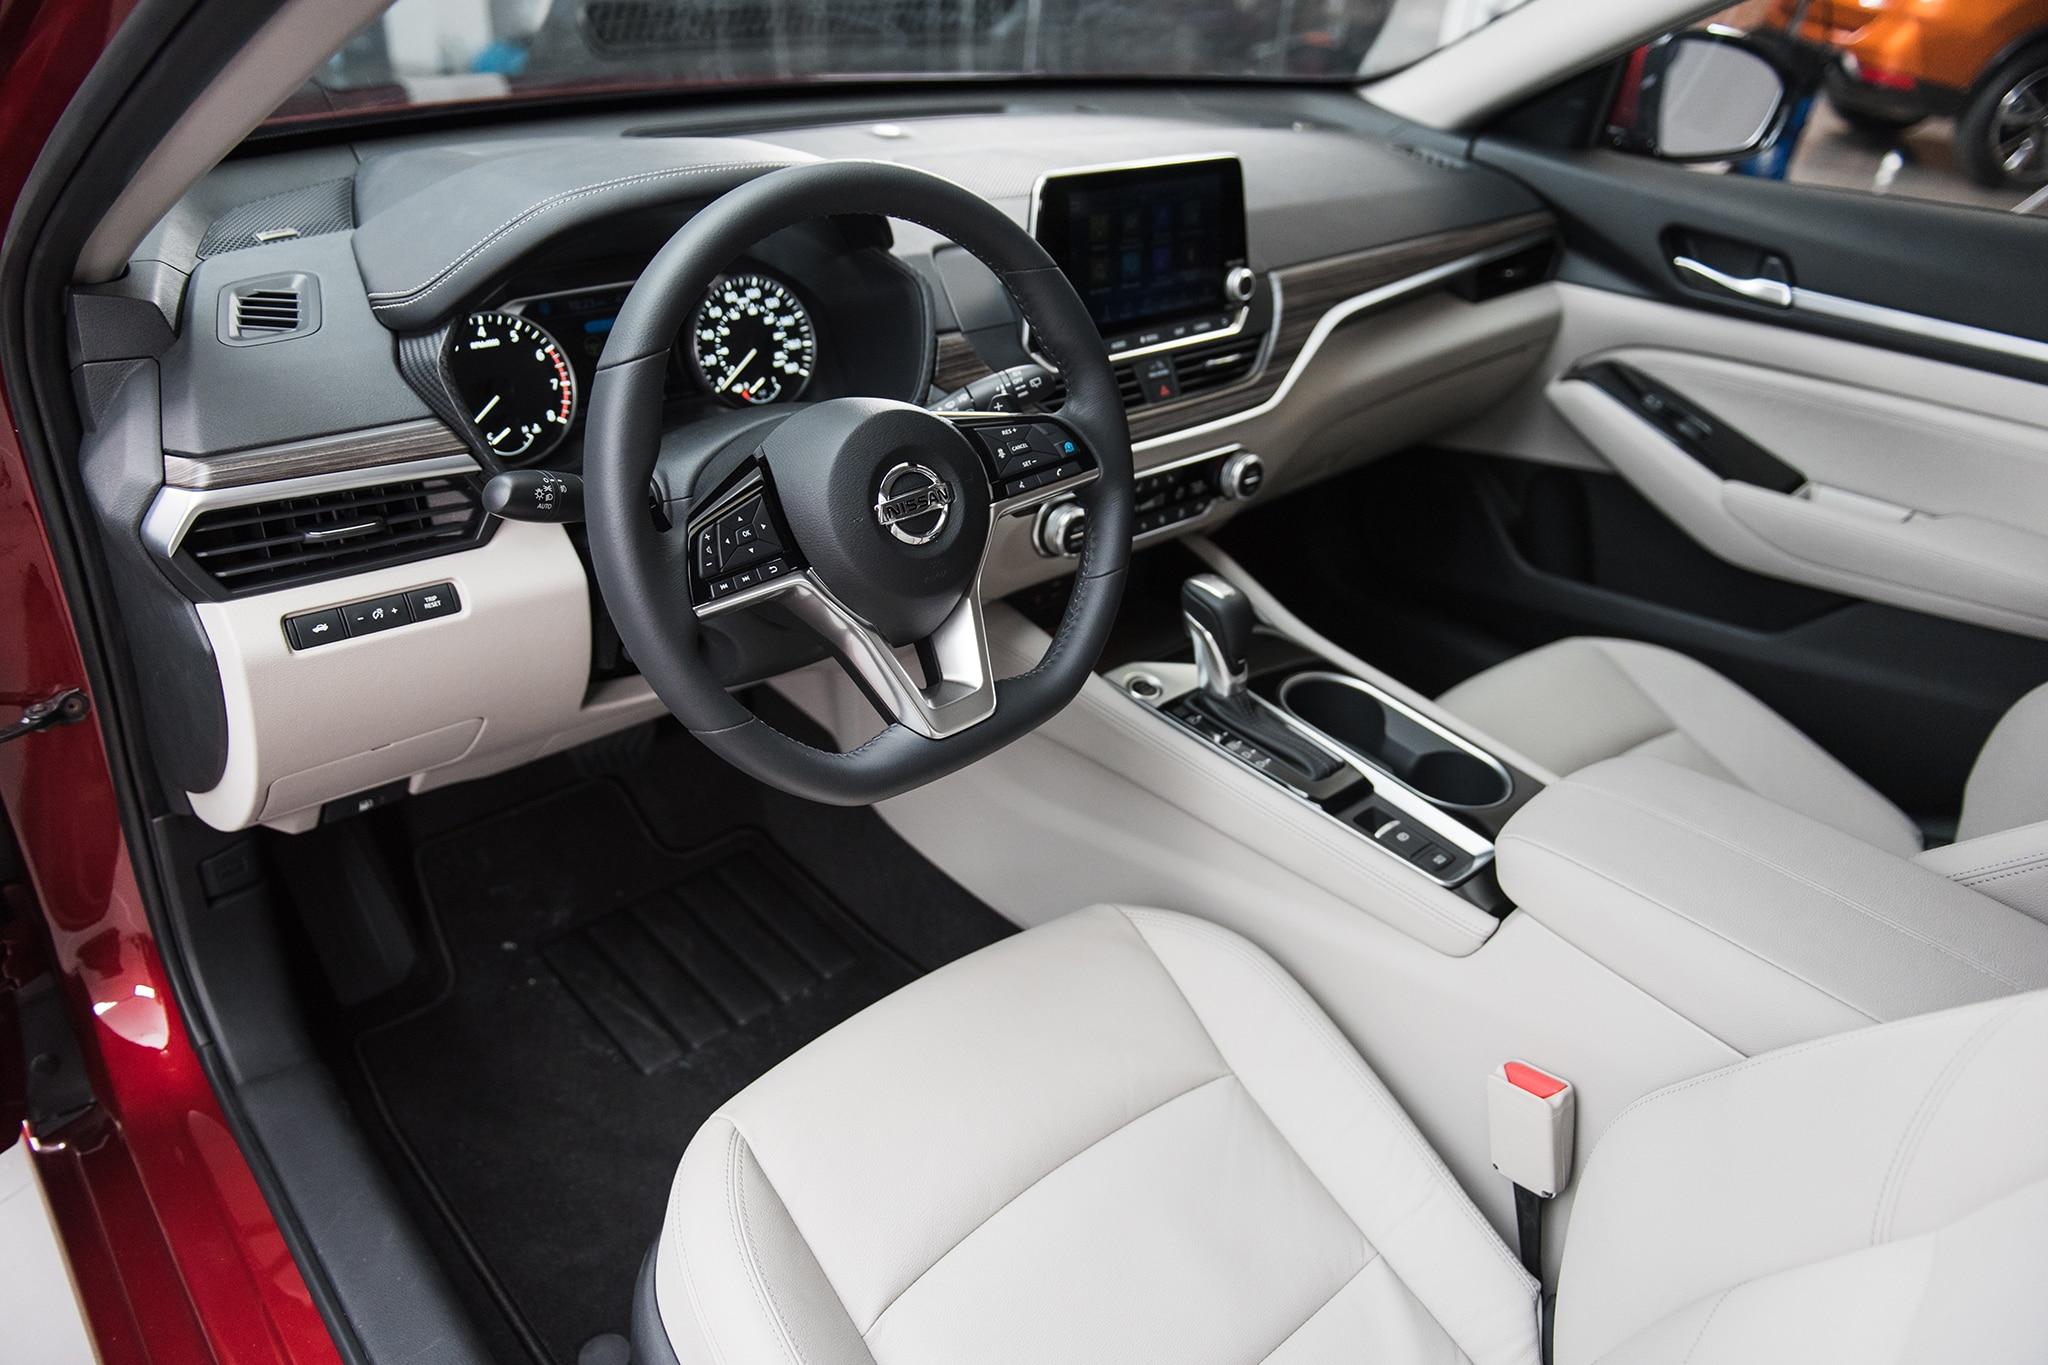 Nissan Altima 2.5Sl >> 2019 Nissan Altima Returns to Battle | Automobile Magazine